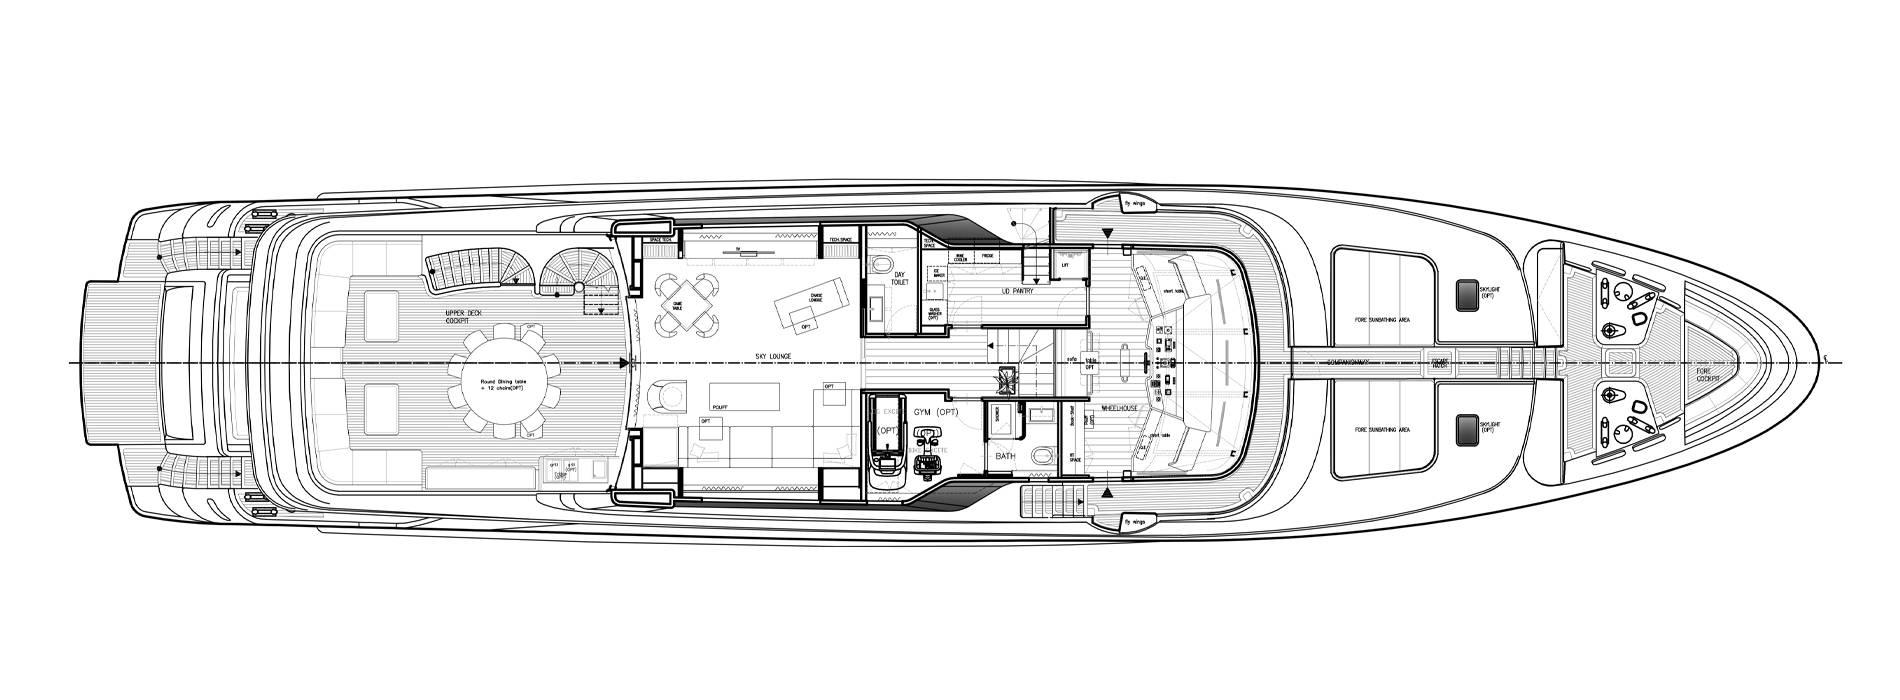 Sanlorenzo Yachts SD122-27 under offer верхний палуба